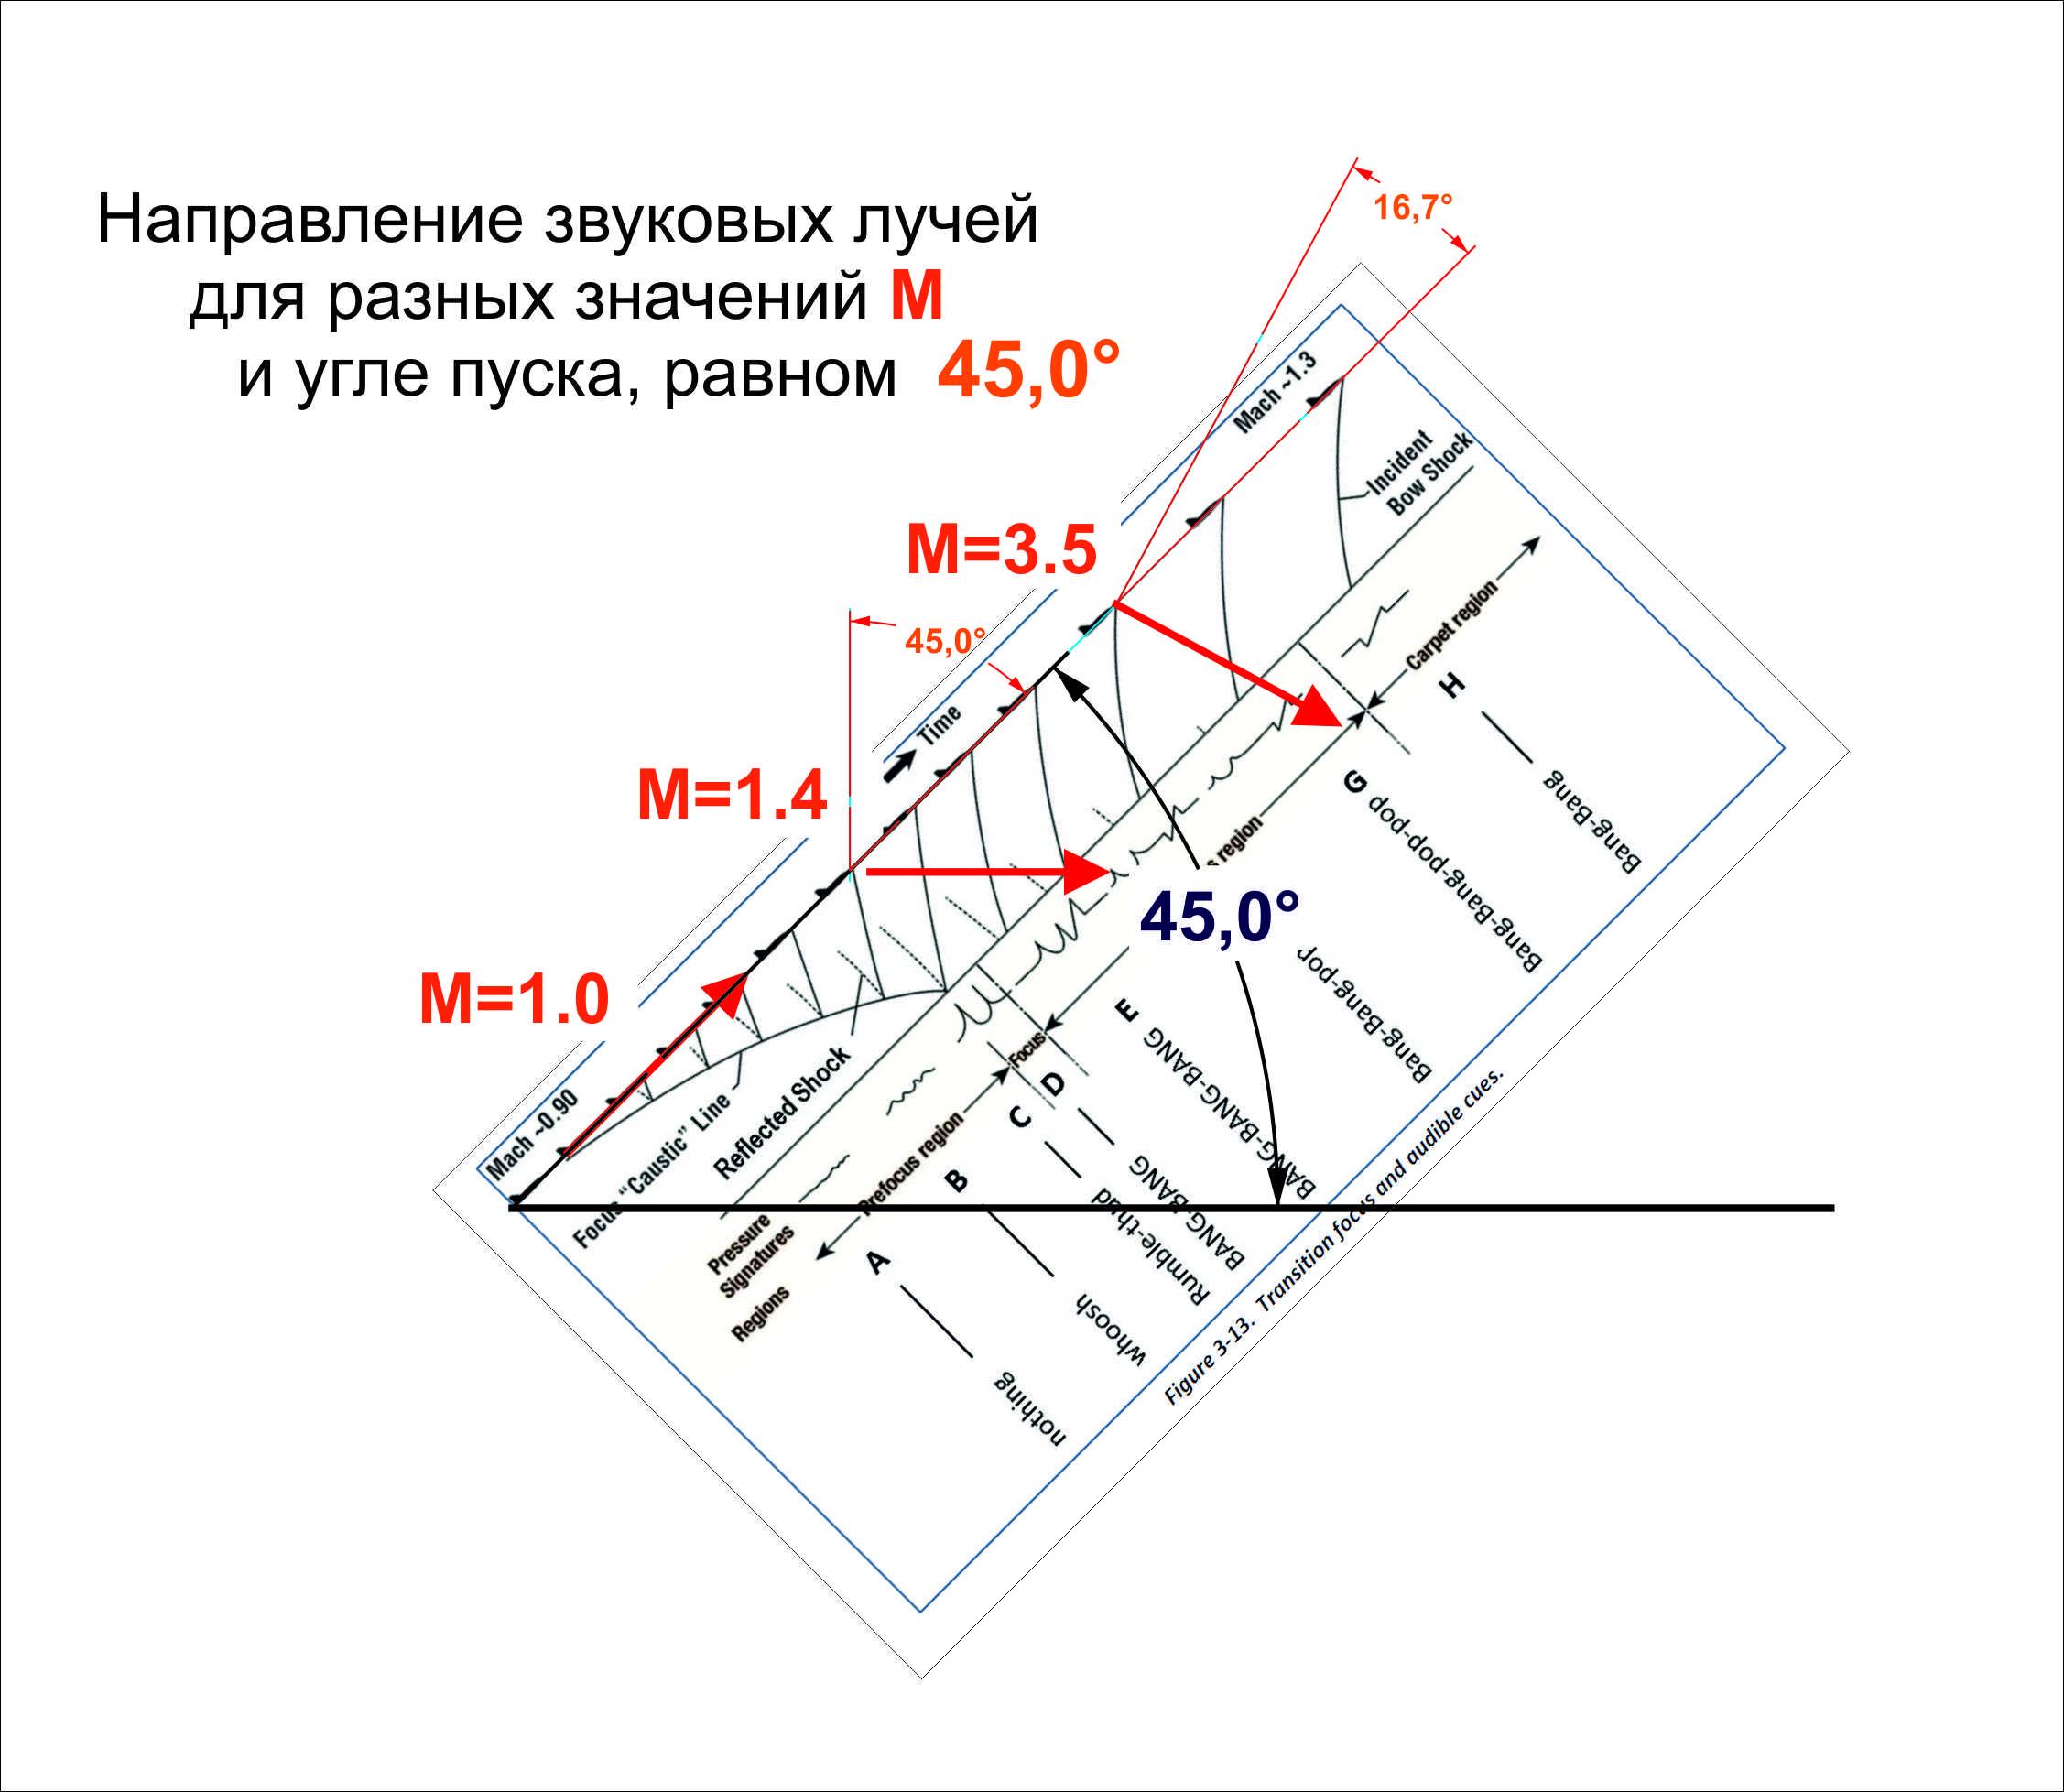 http://images.vfl.ru/ii/1631882508/f8553194/35898489.jpg